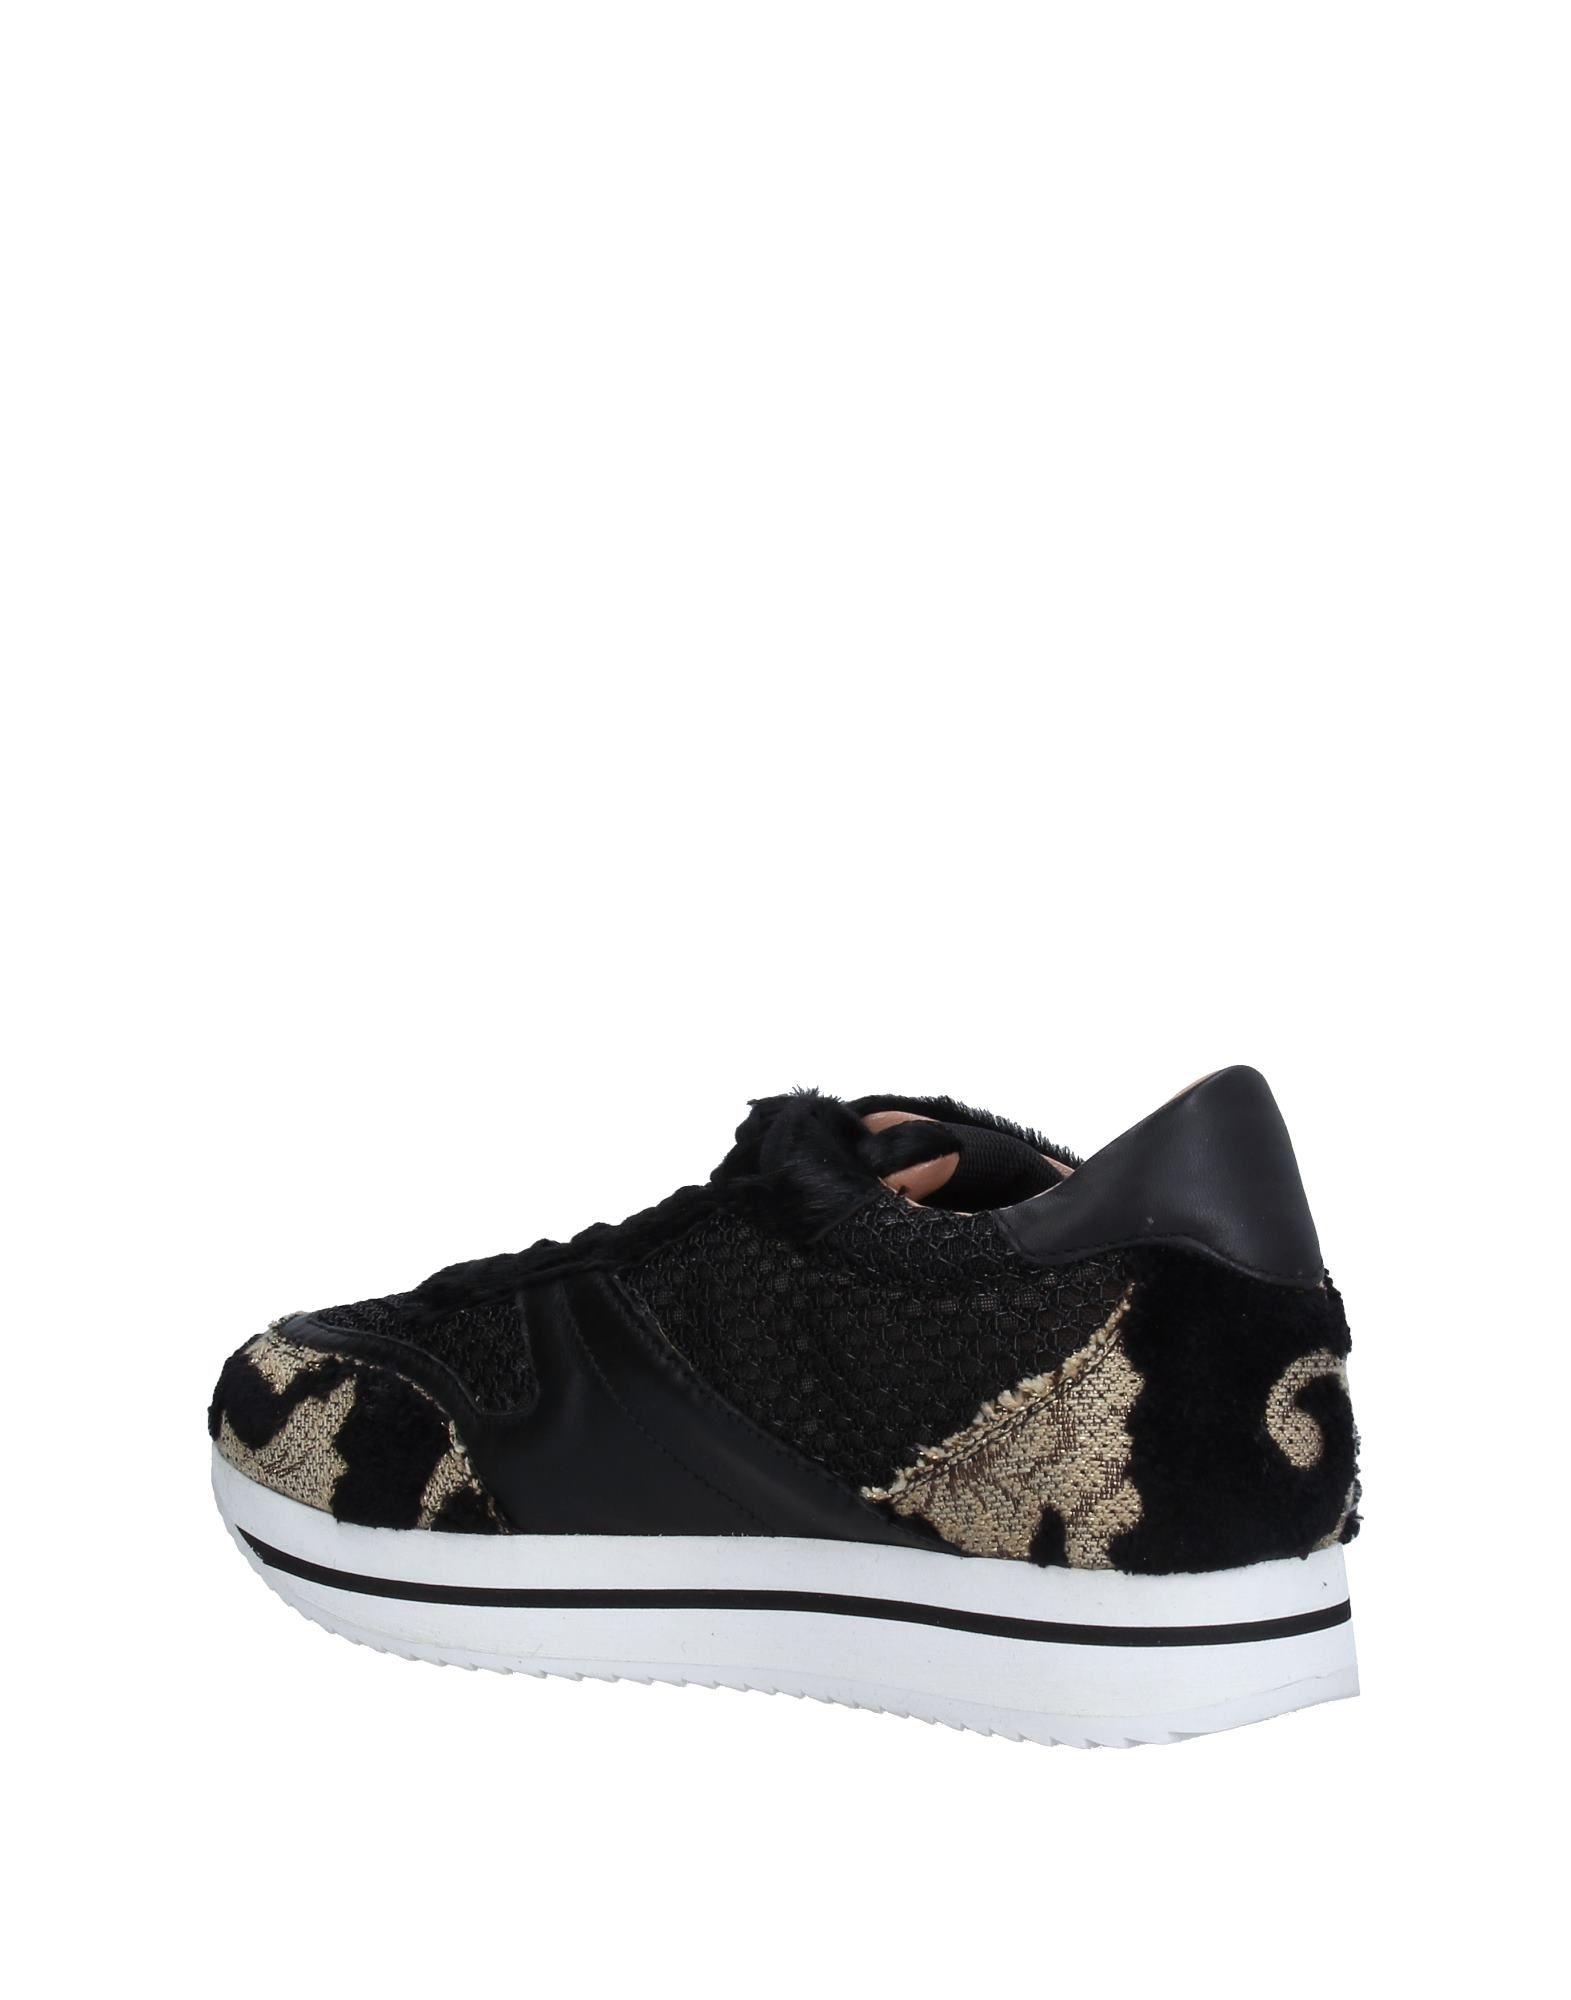 Twin 11239428KR Gute Qualität beliebte Schuhe Schuhe beliebte dd3532